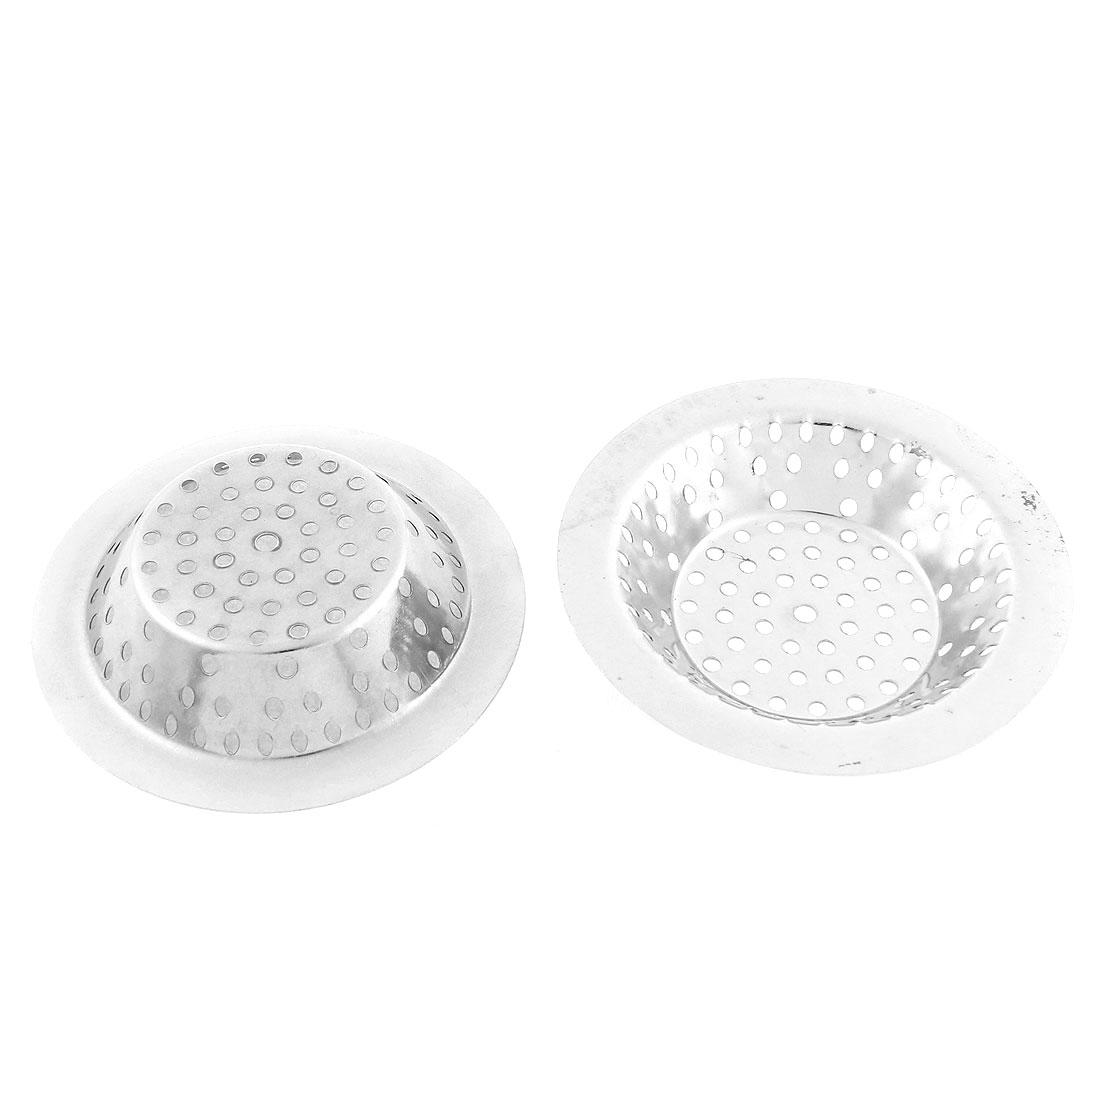 Household Stainless Steel Sink Strainer Drainer Filter Stopper 106mm Dia 2pcs